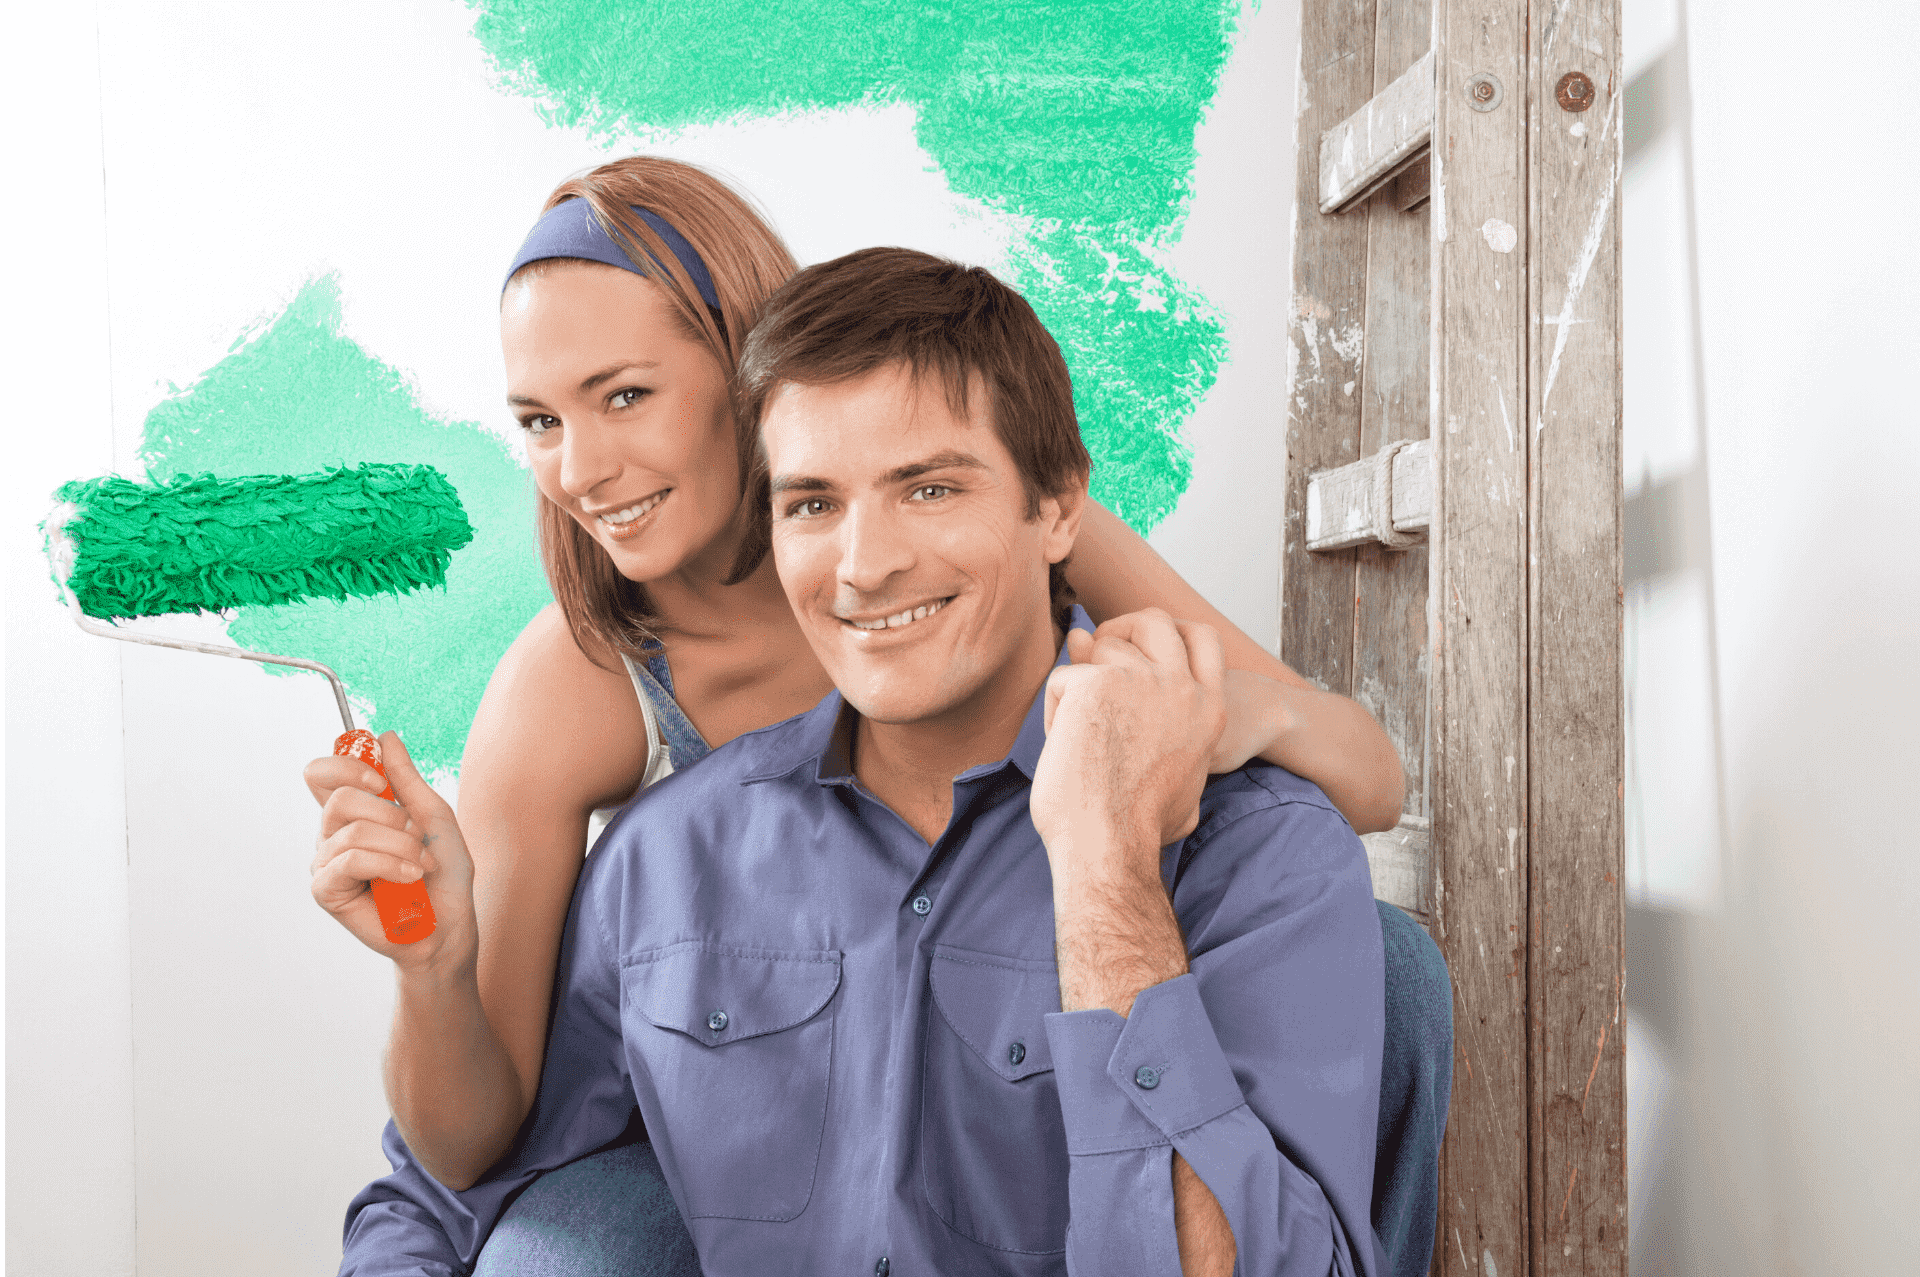 100% Home Equity Loan